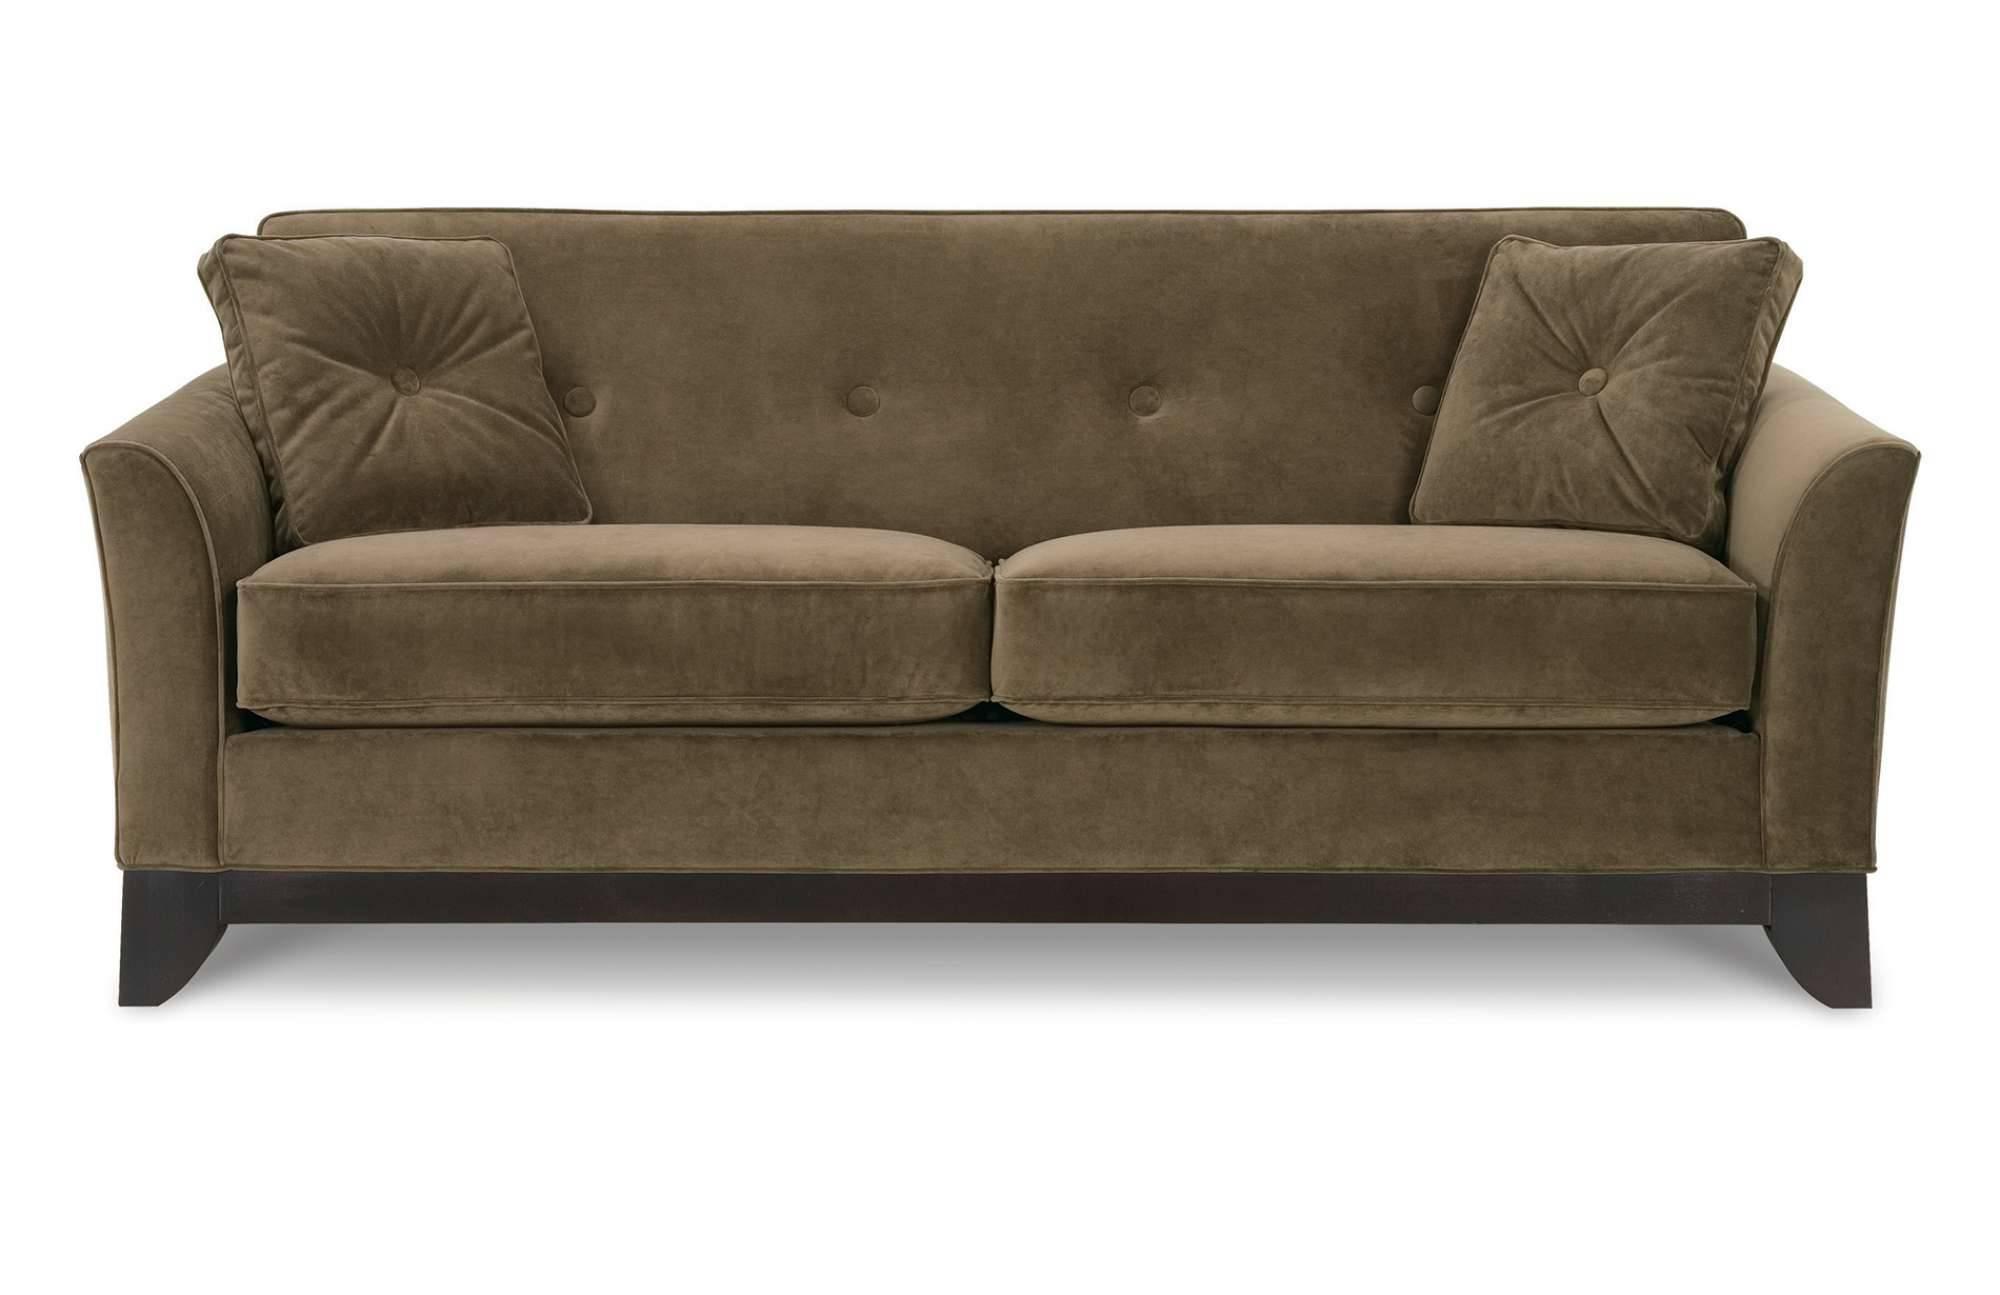 Sofas Center : Fancy Sofa Set Sets Singular Photo Ideas 1200Px Web pertaining to Fancy Sofas (Image 24 of 30)